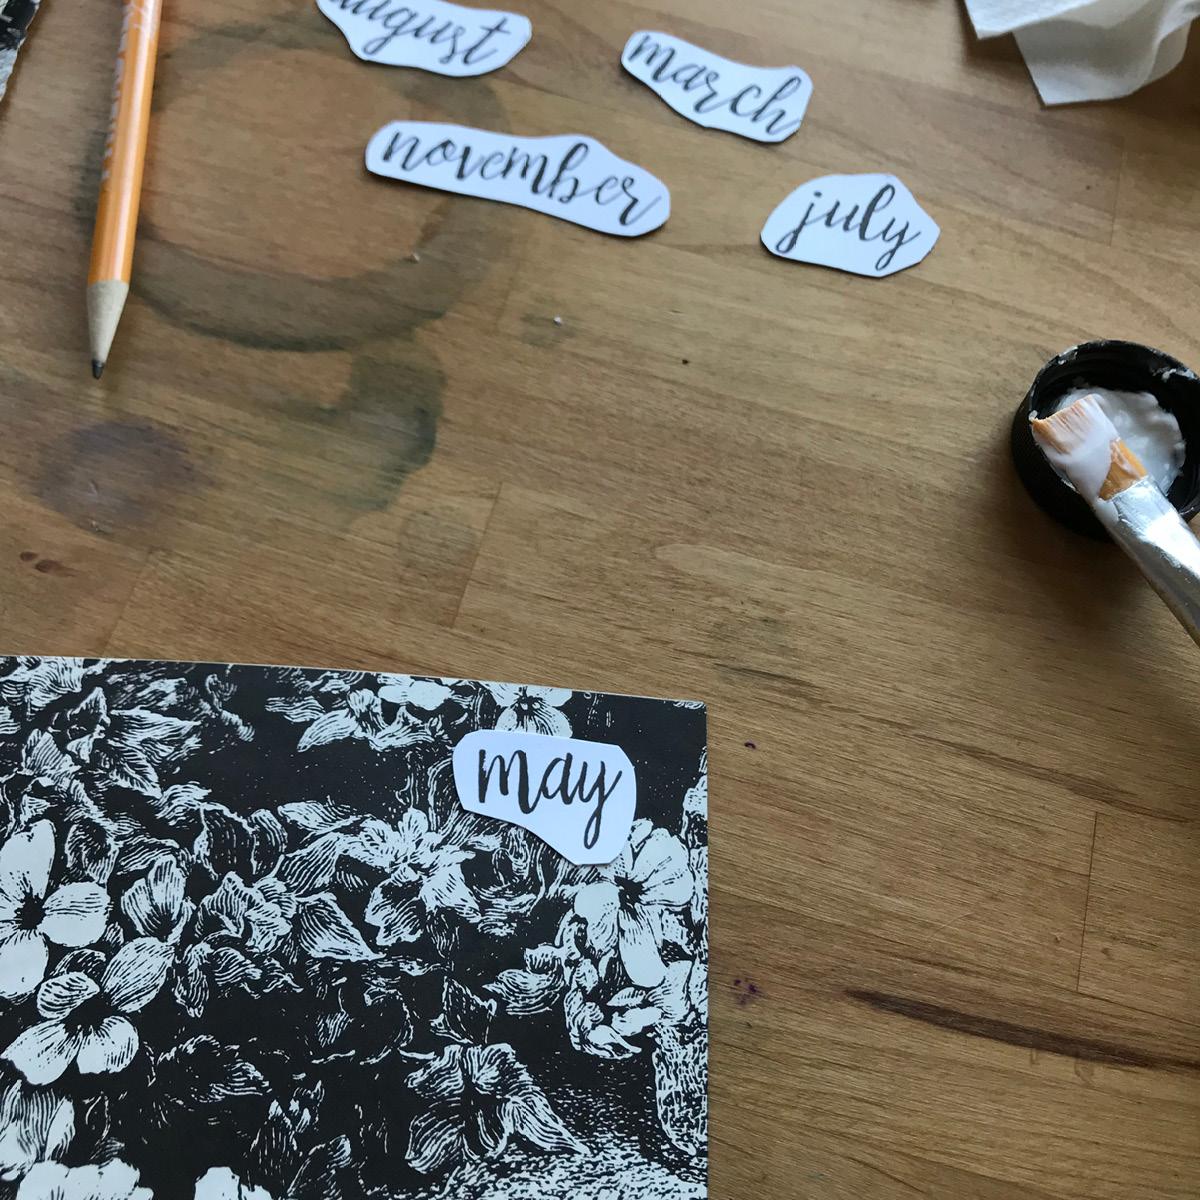 close-up, may, vintage book, pencil, glue